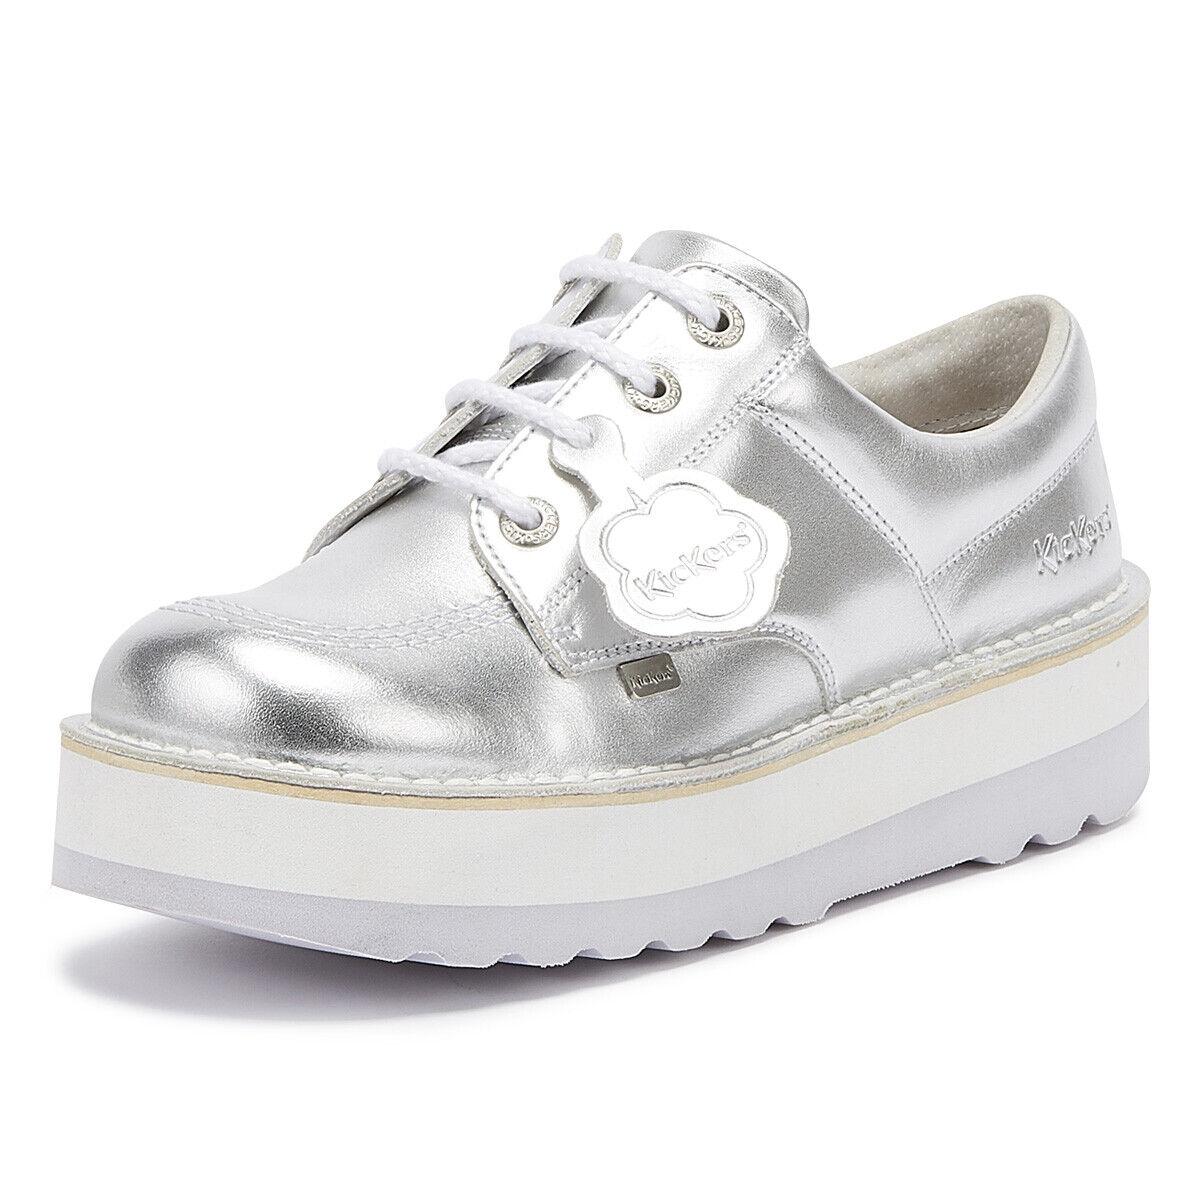 Kickers Kick Lo Stack mujer Metallic   plata zapatos Lace Up Leather Platforms